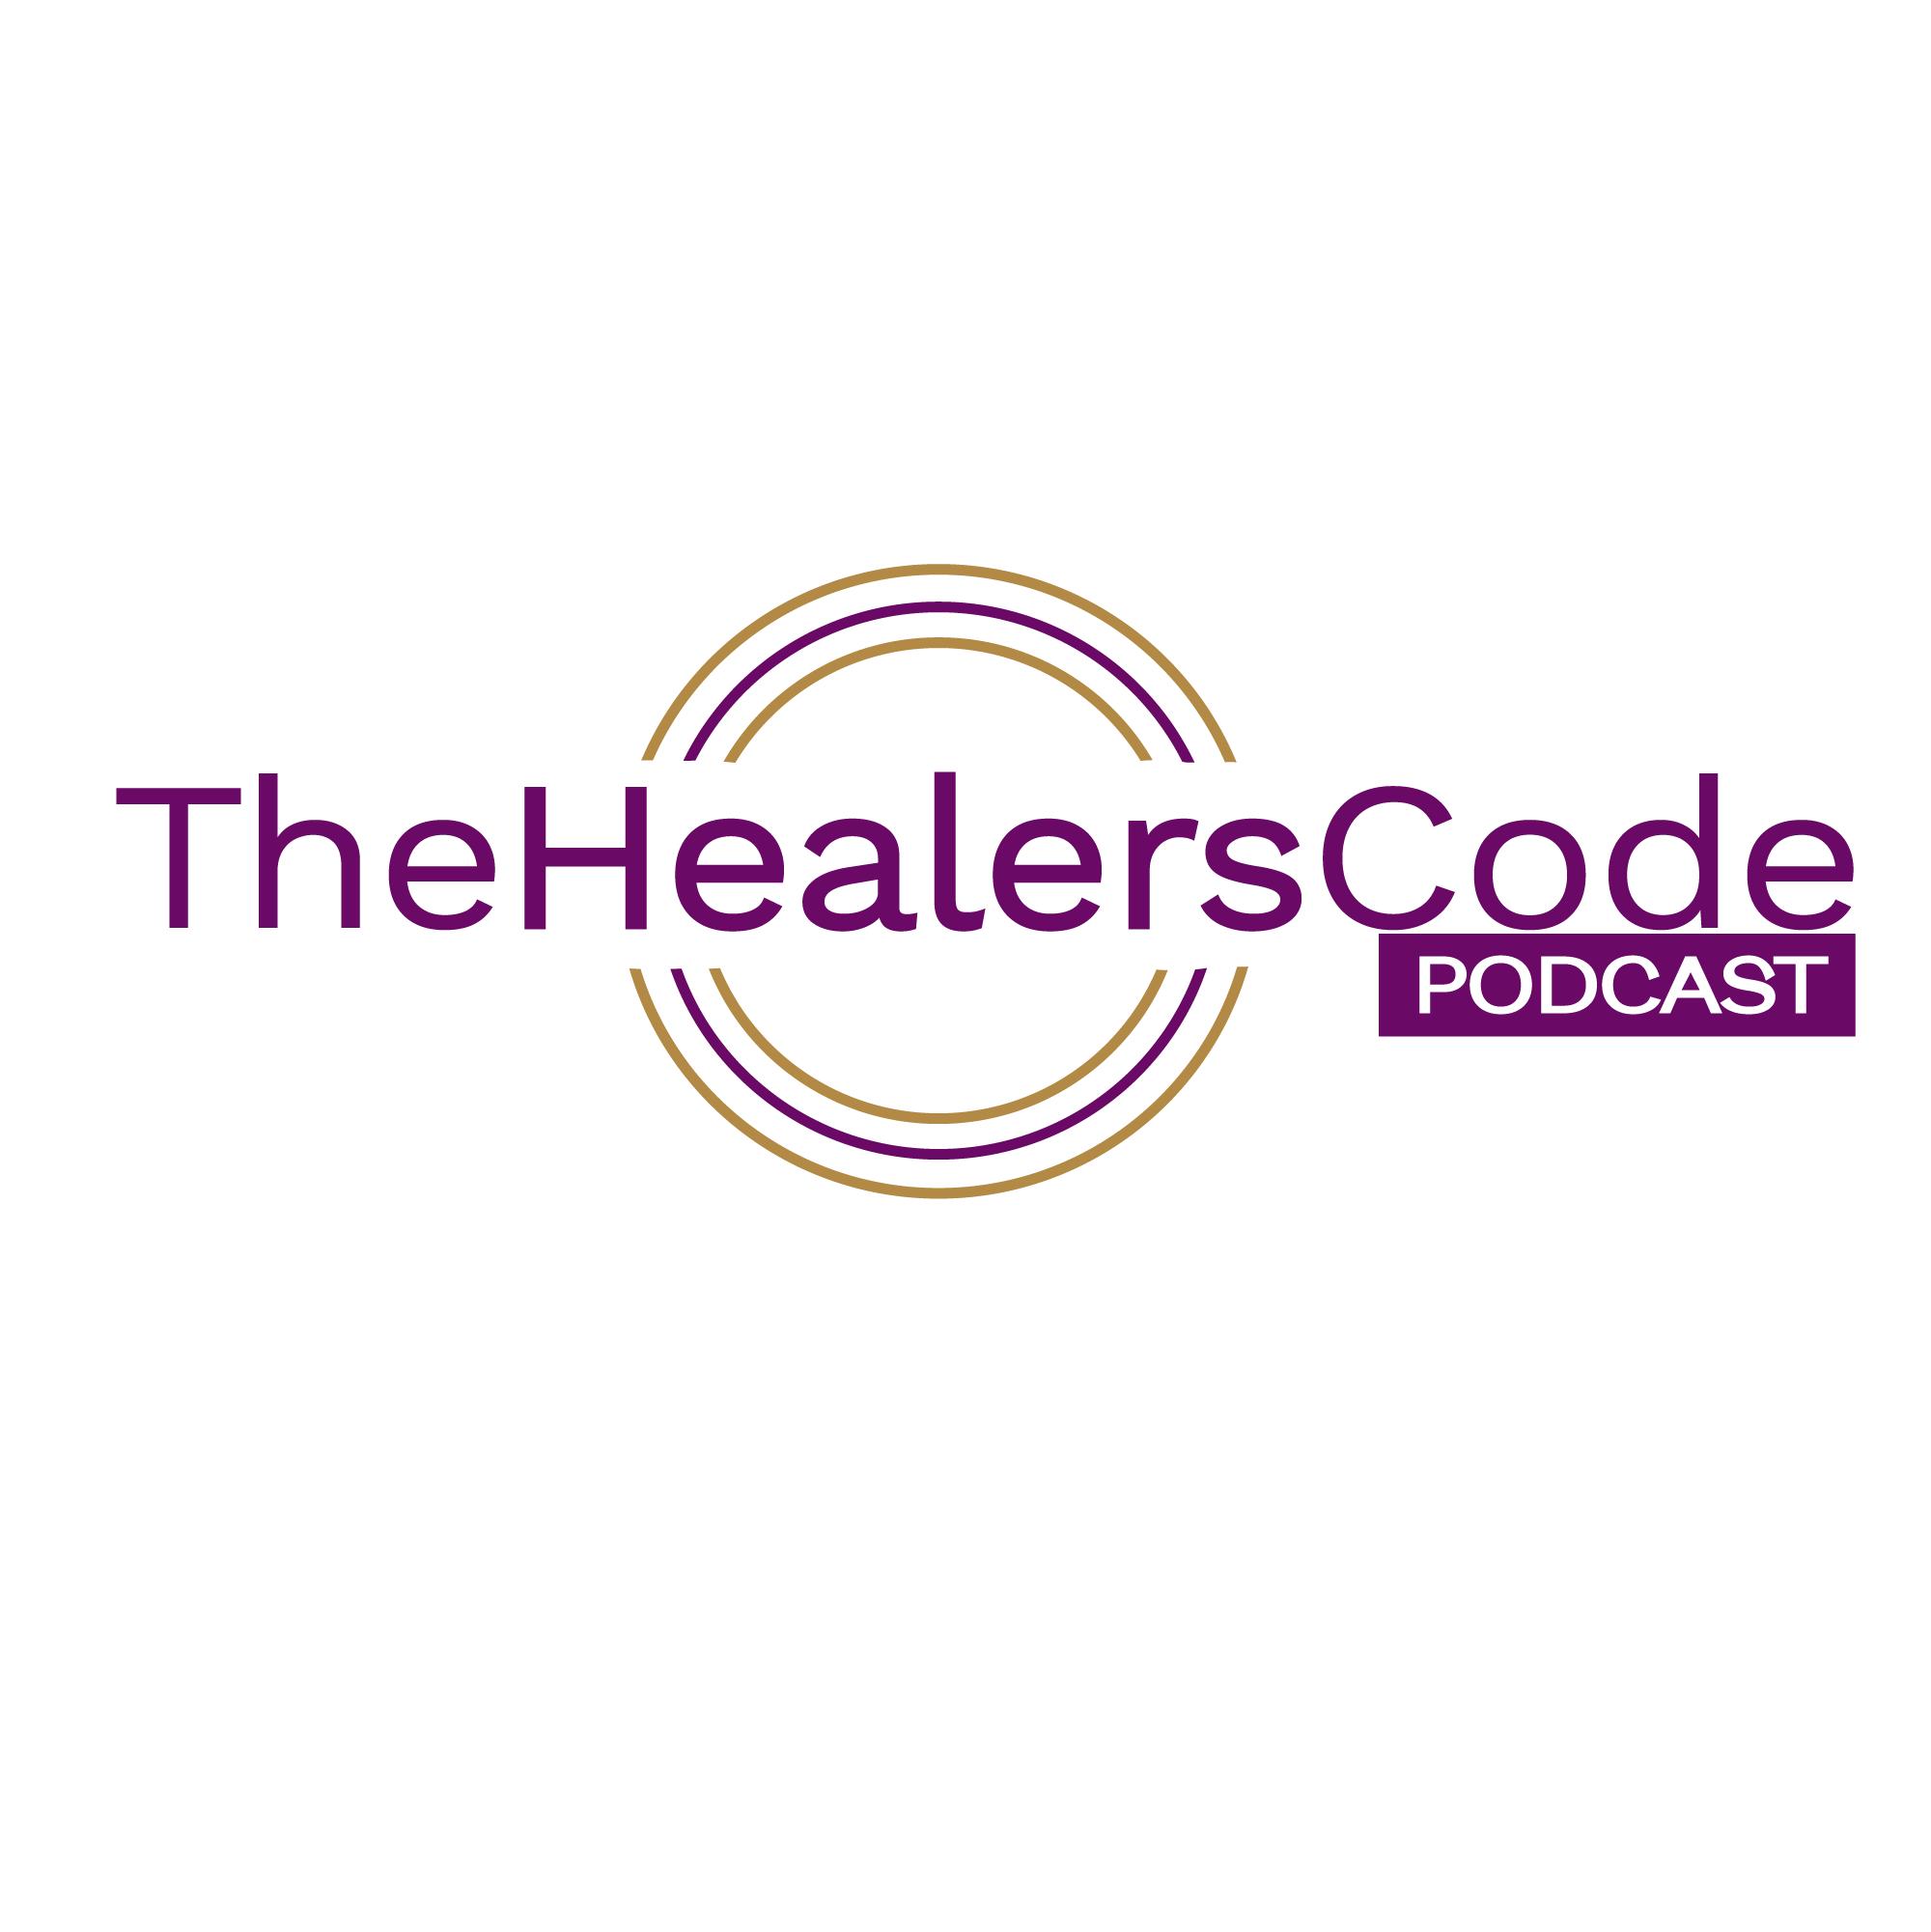 The Healer's Code Podcast show art